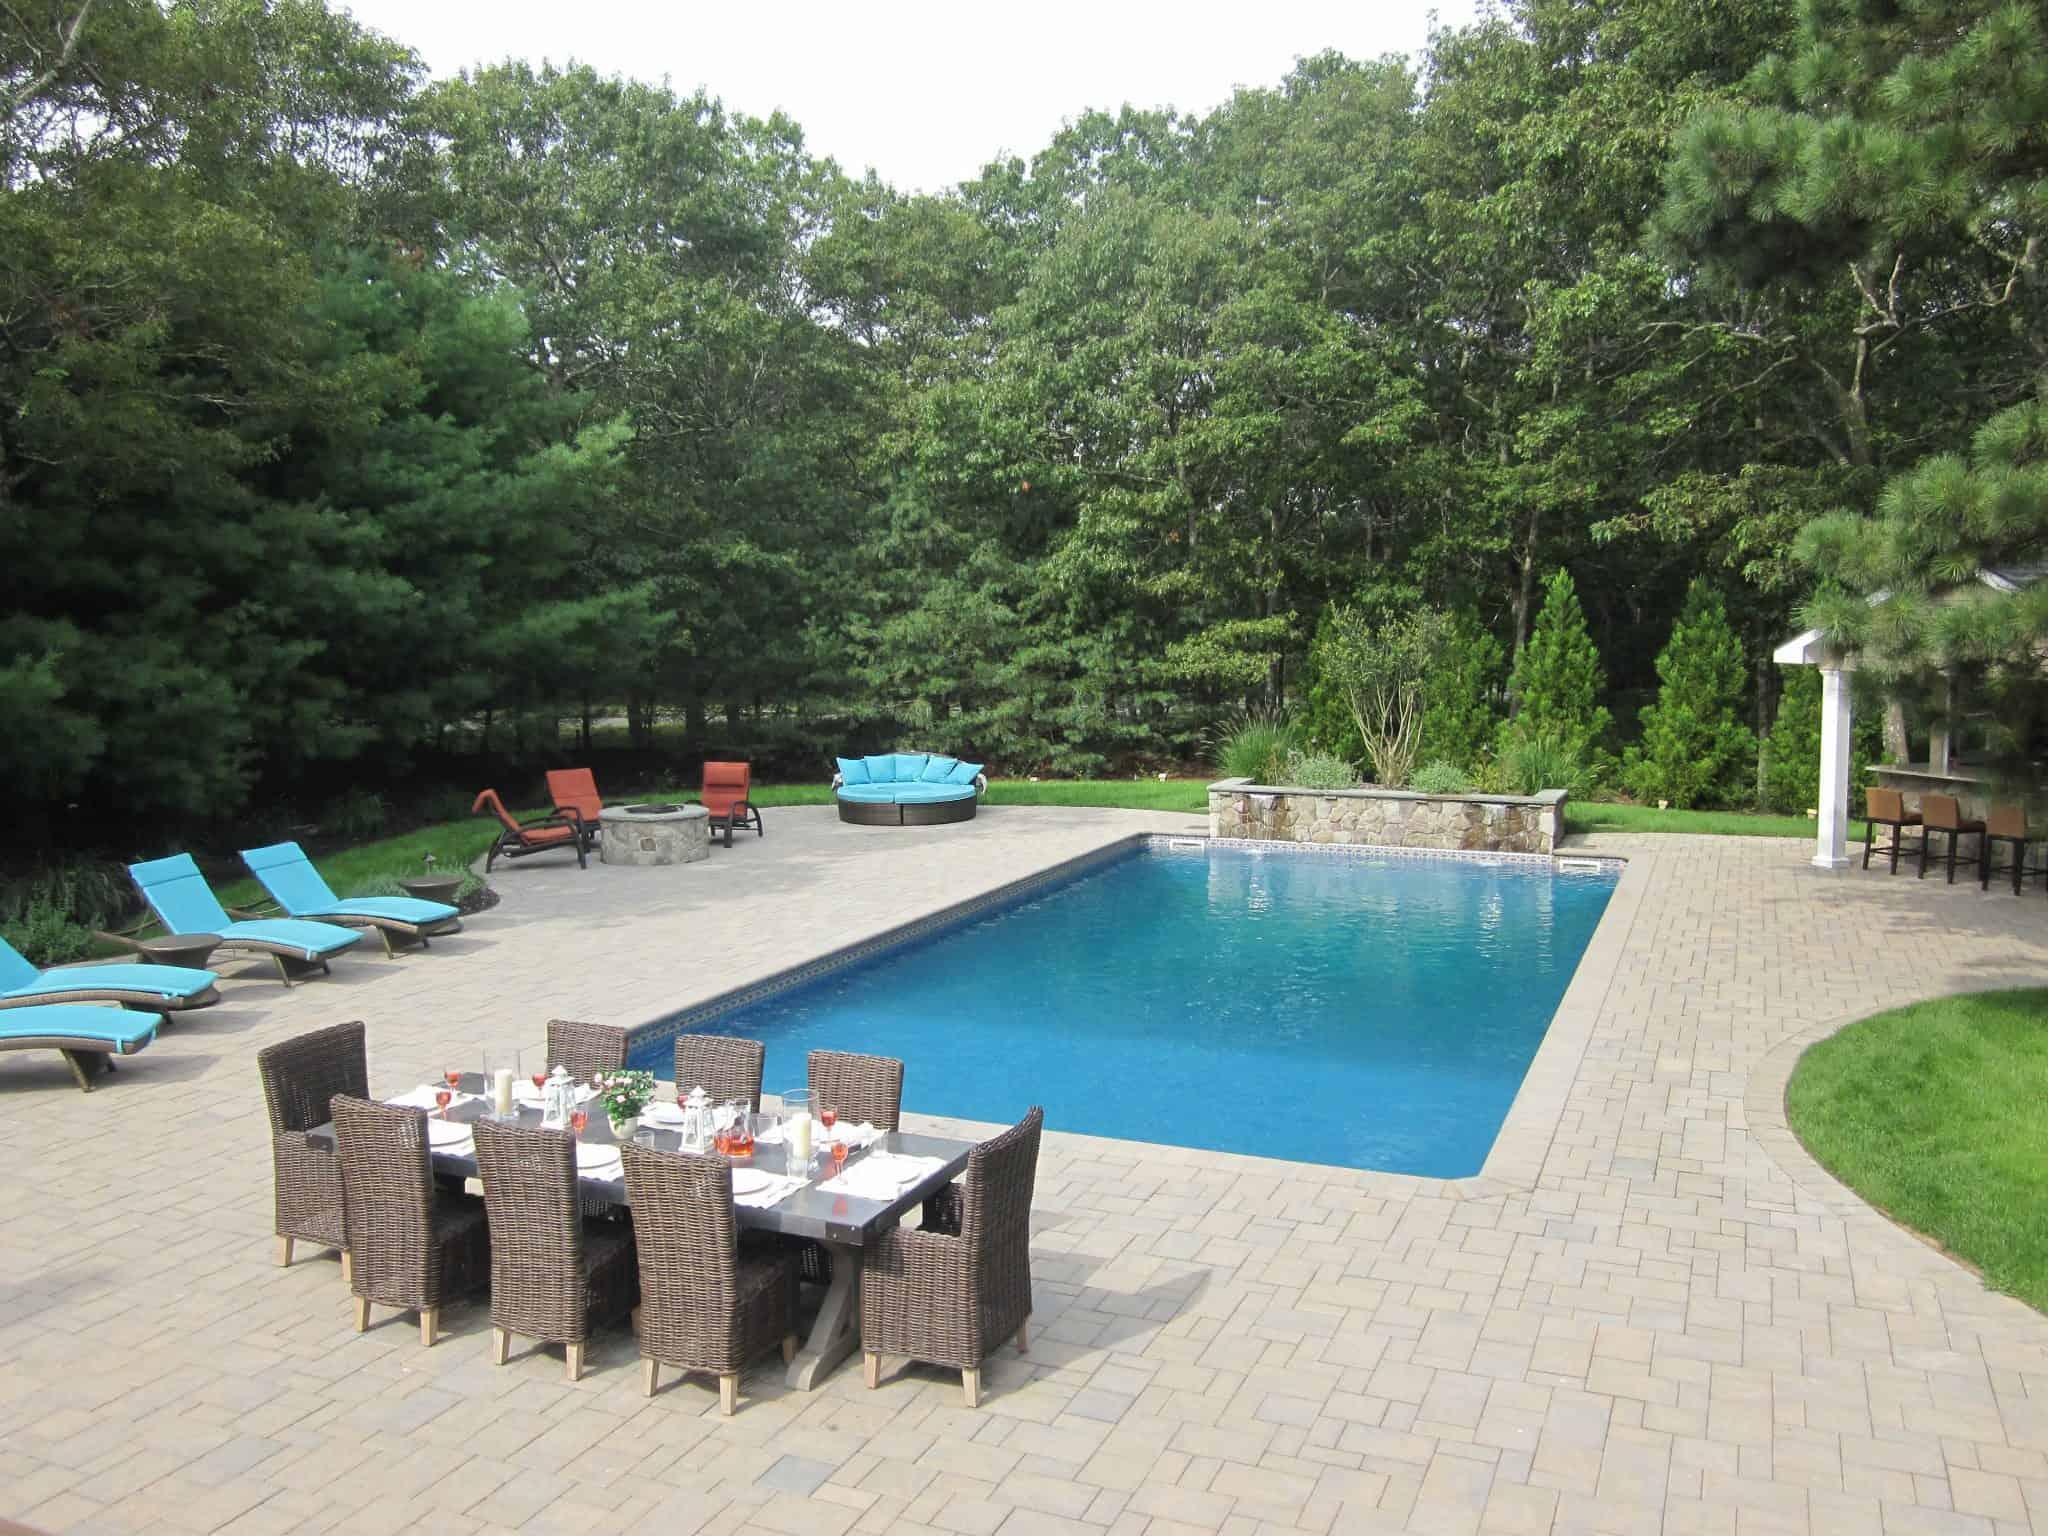 Paver Patio - Cambridge Ledgestone- Toffee Onyx - Pool Patio- Random Pattern - Hampton Bays, Long Island NY